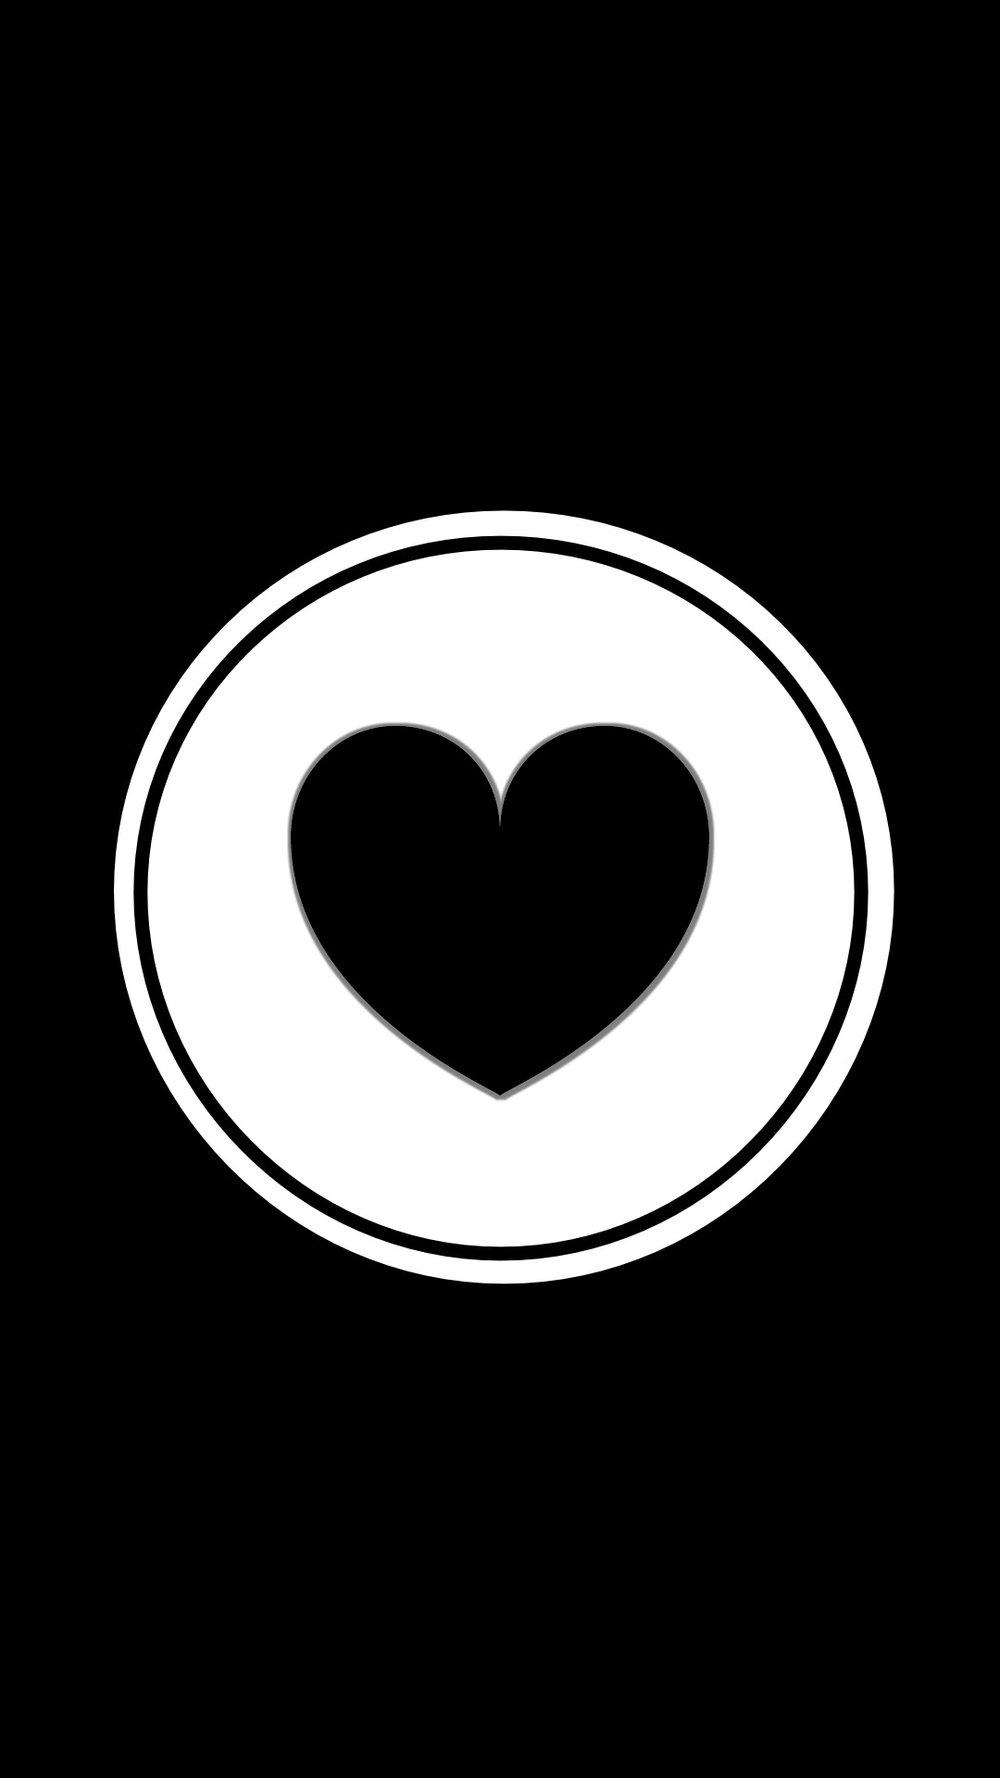 Instagram-cover-love-black.jpg